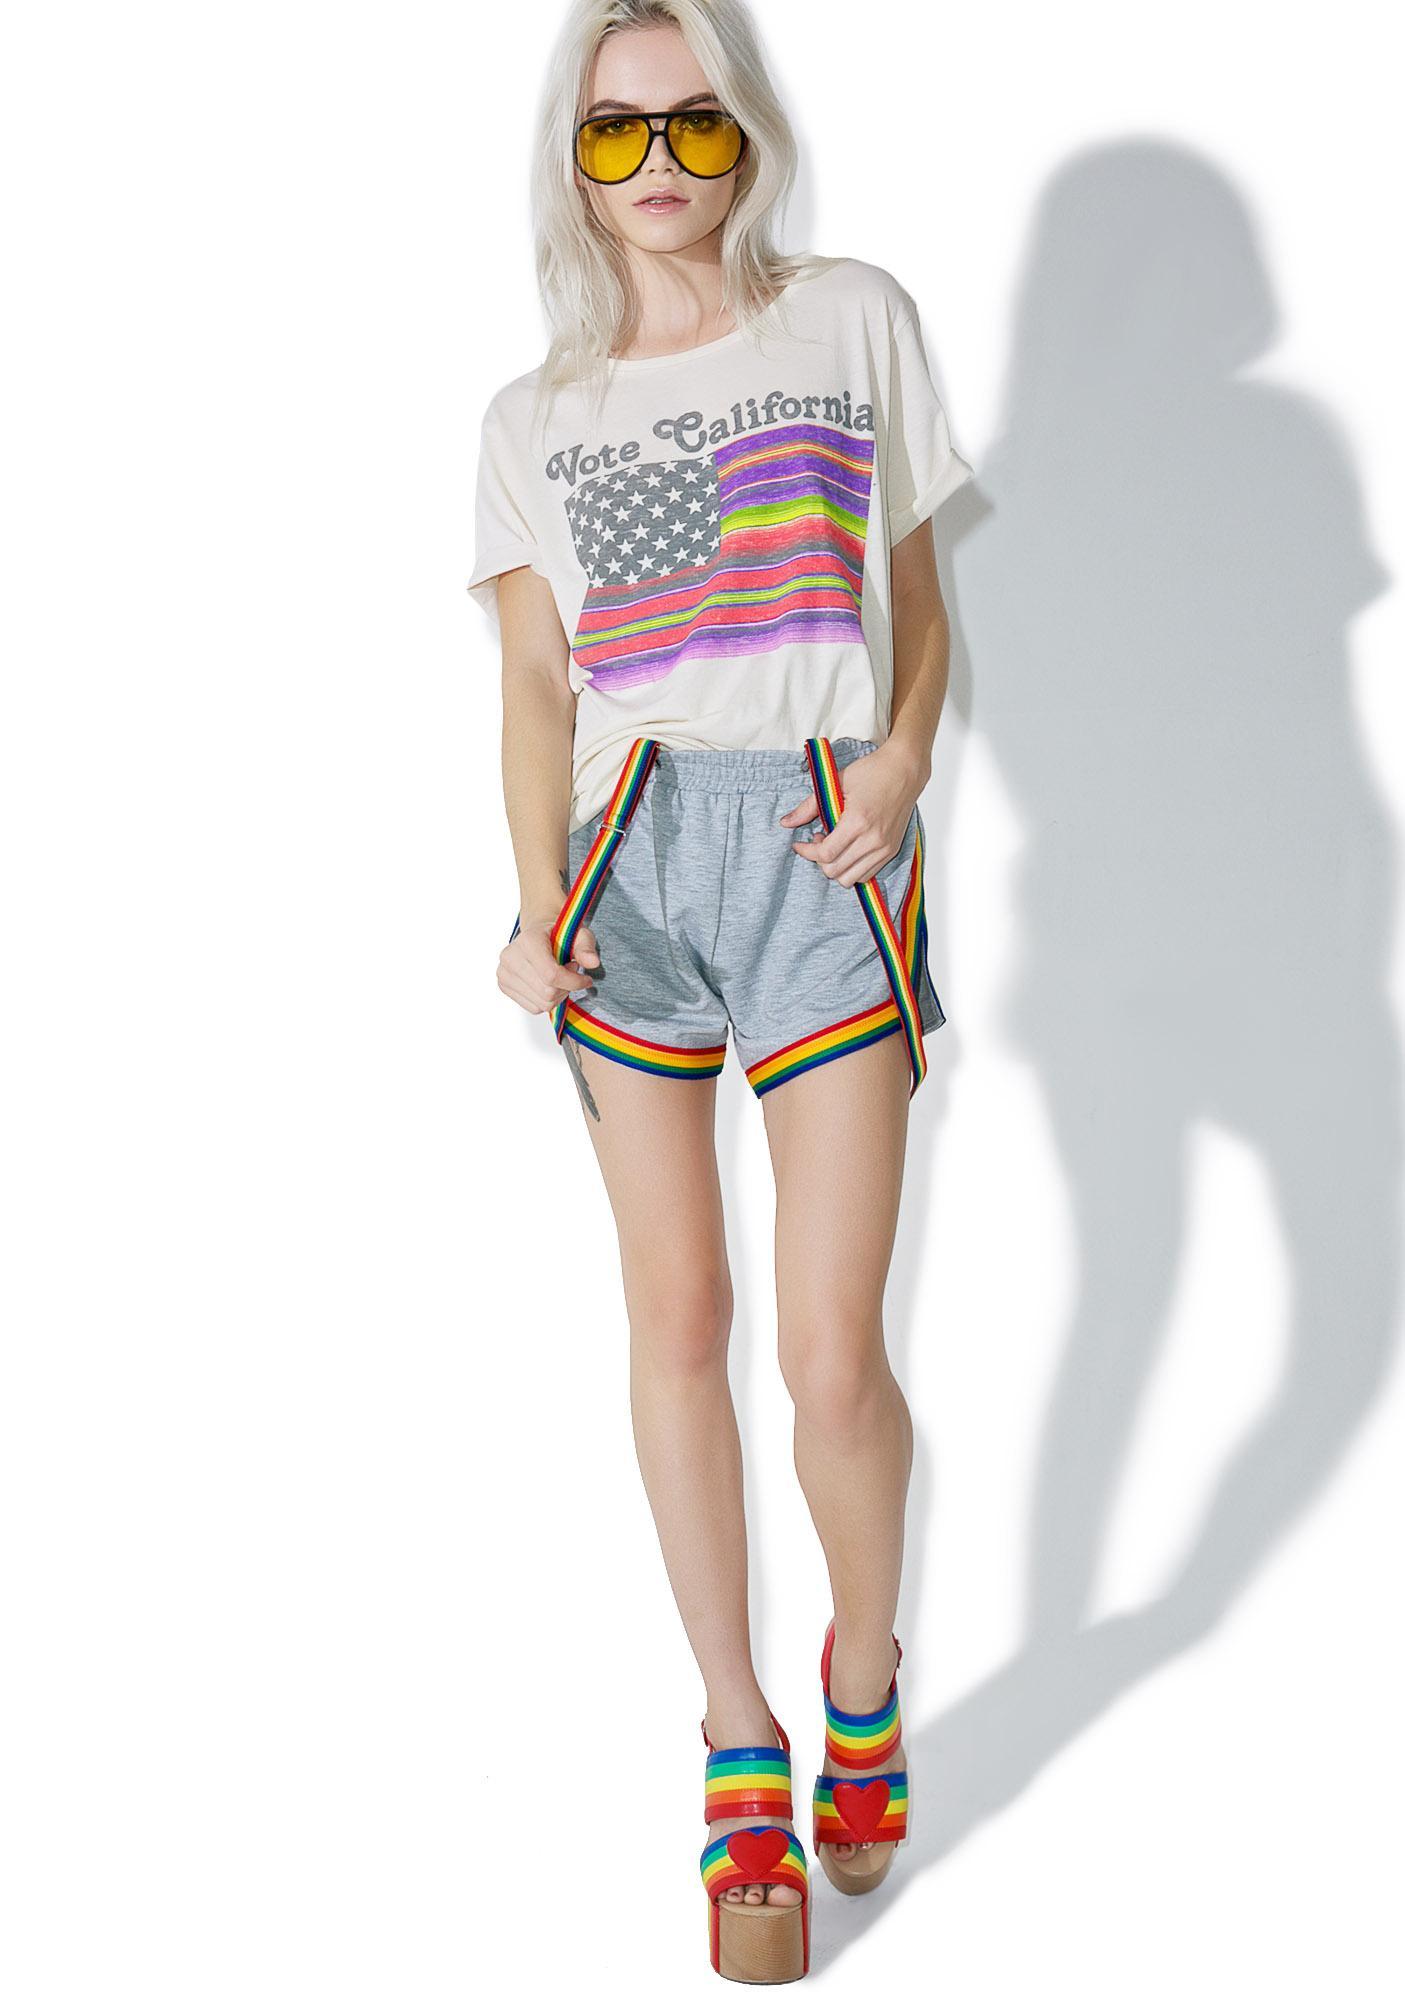 junk food clothing vote california dolls kill